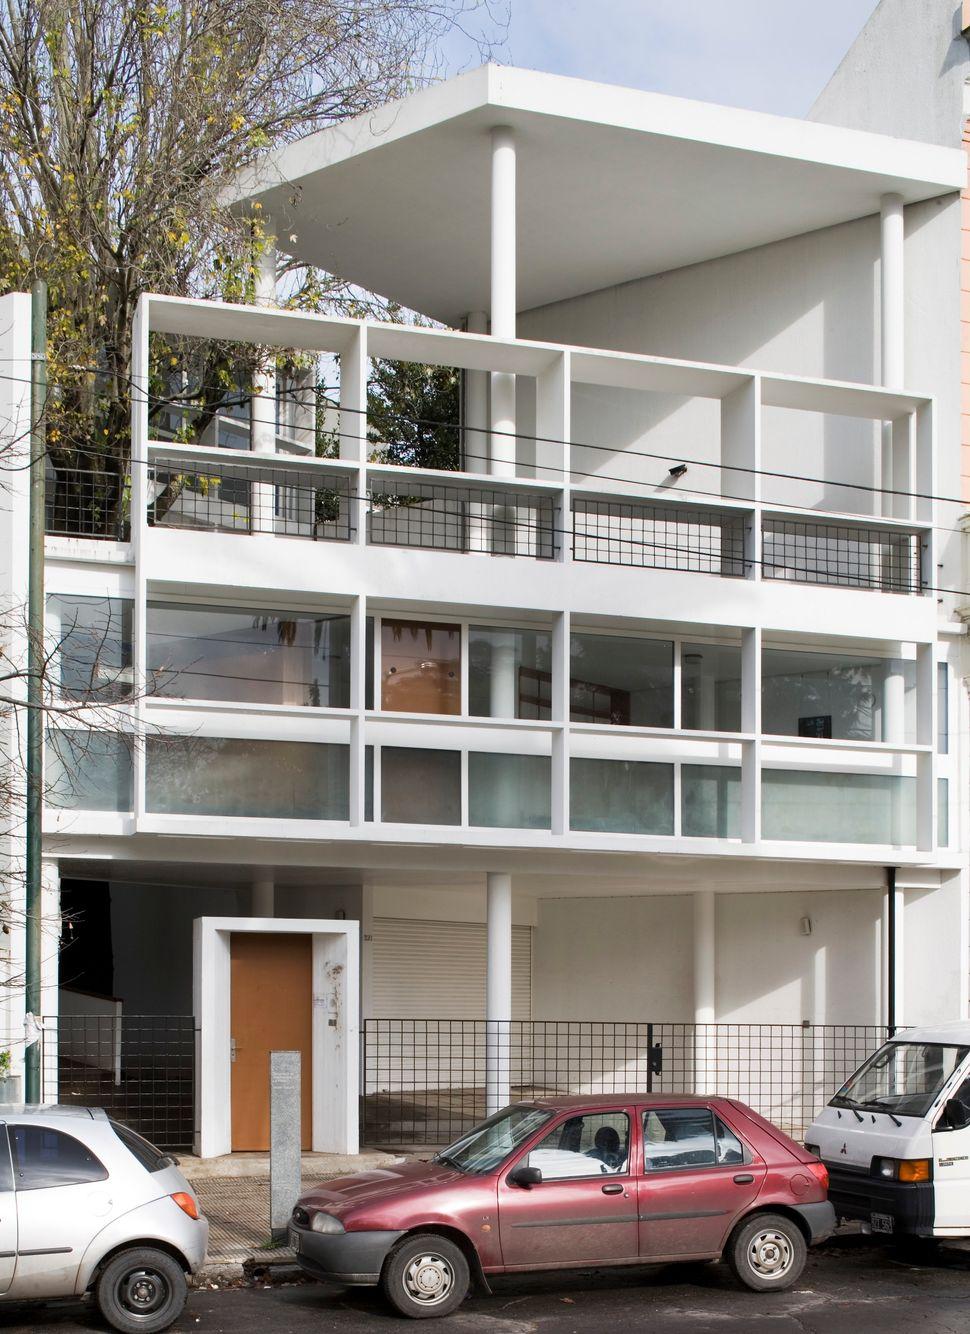 Maison Curutchet, a 1949 residence Le Corbusier designed in La Plata, Argentina.